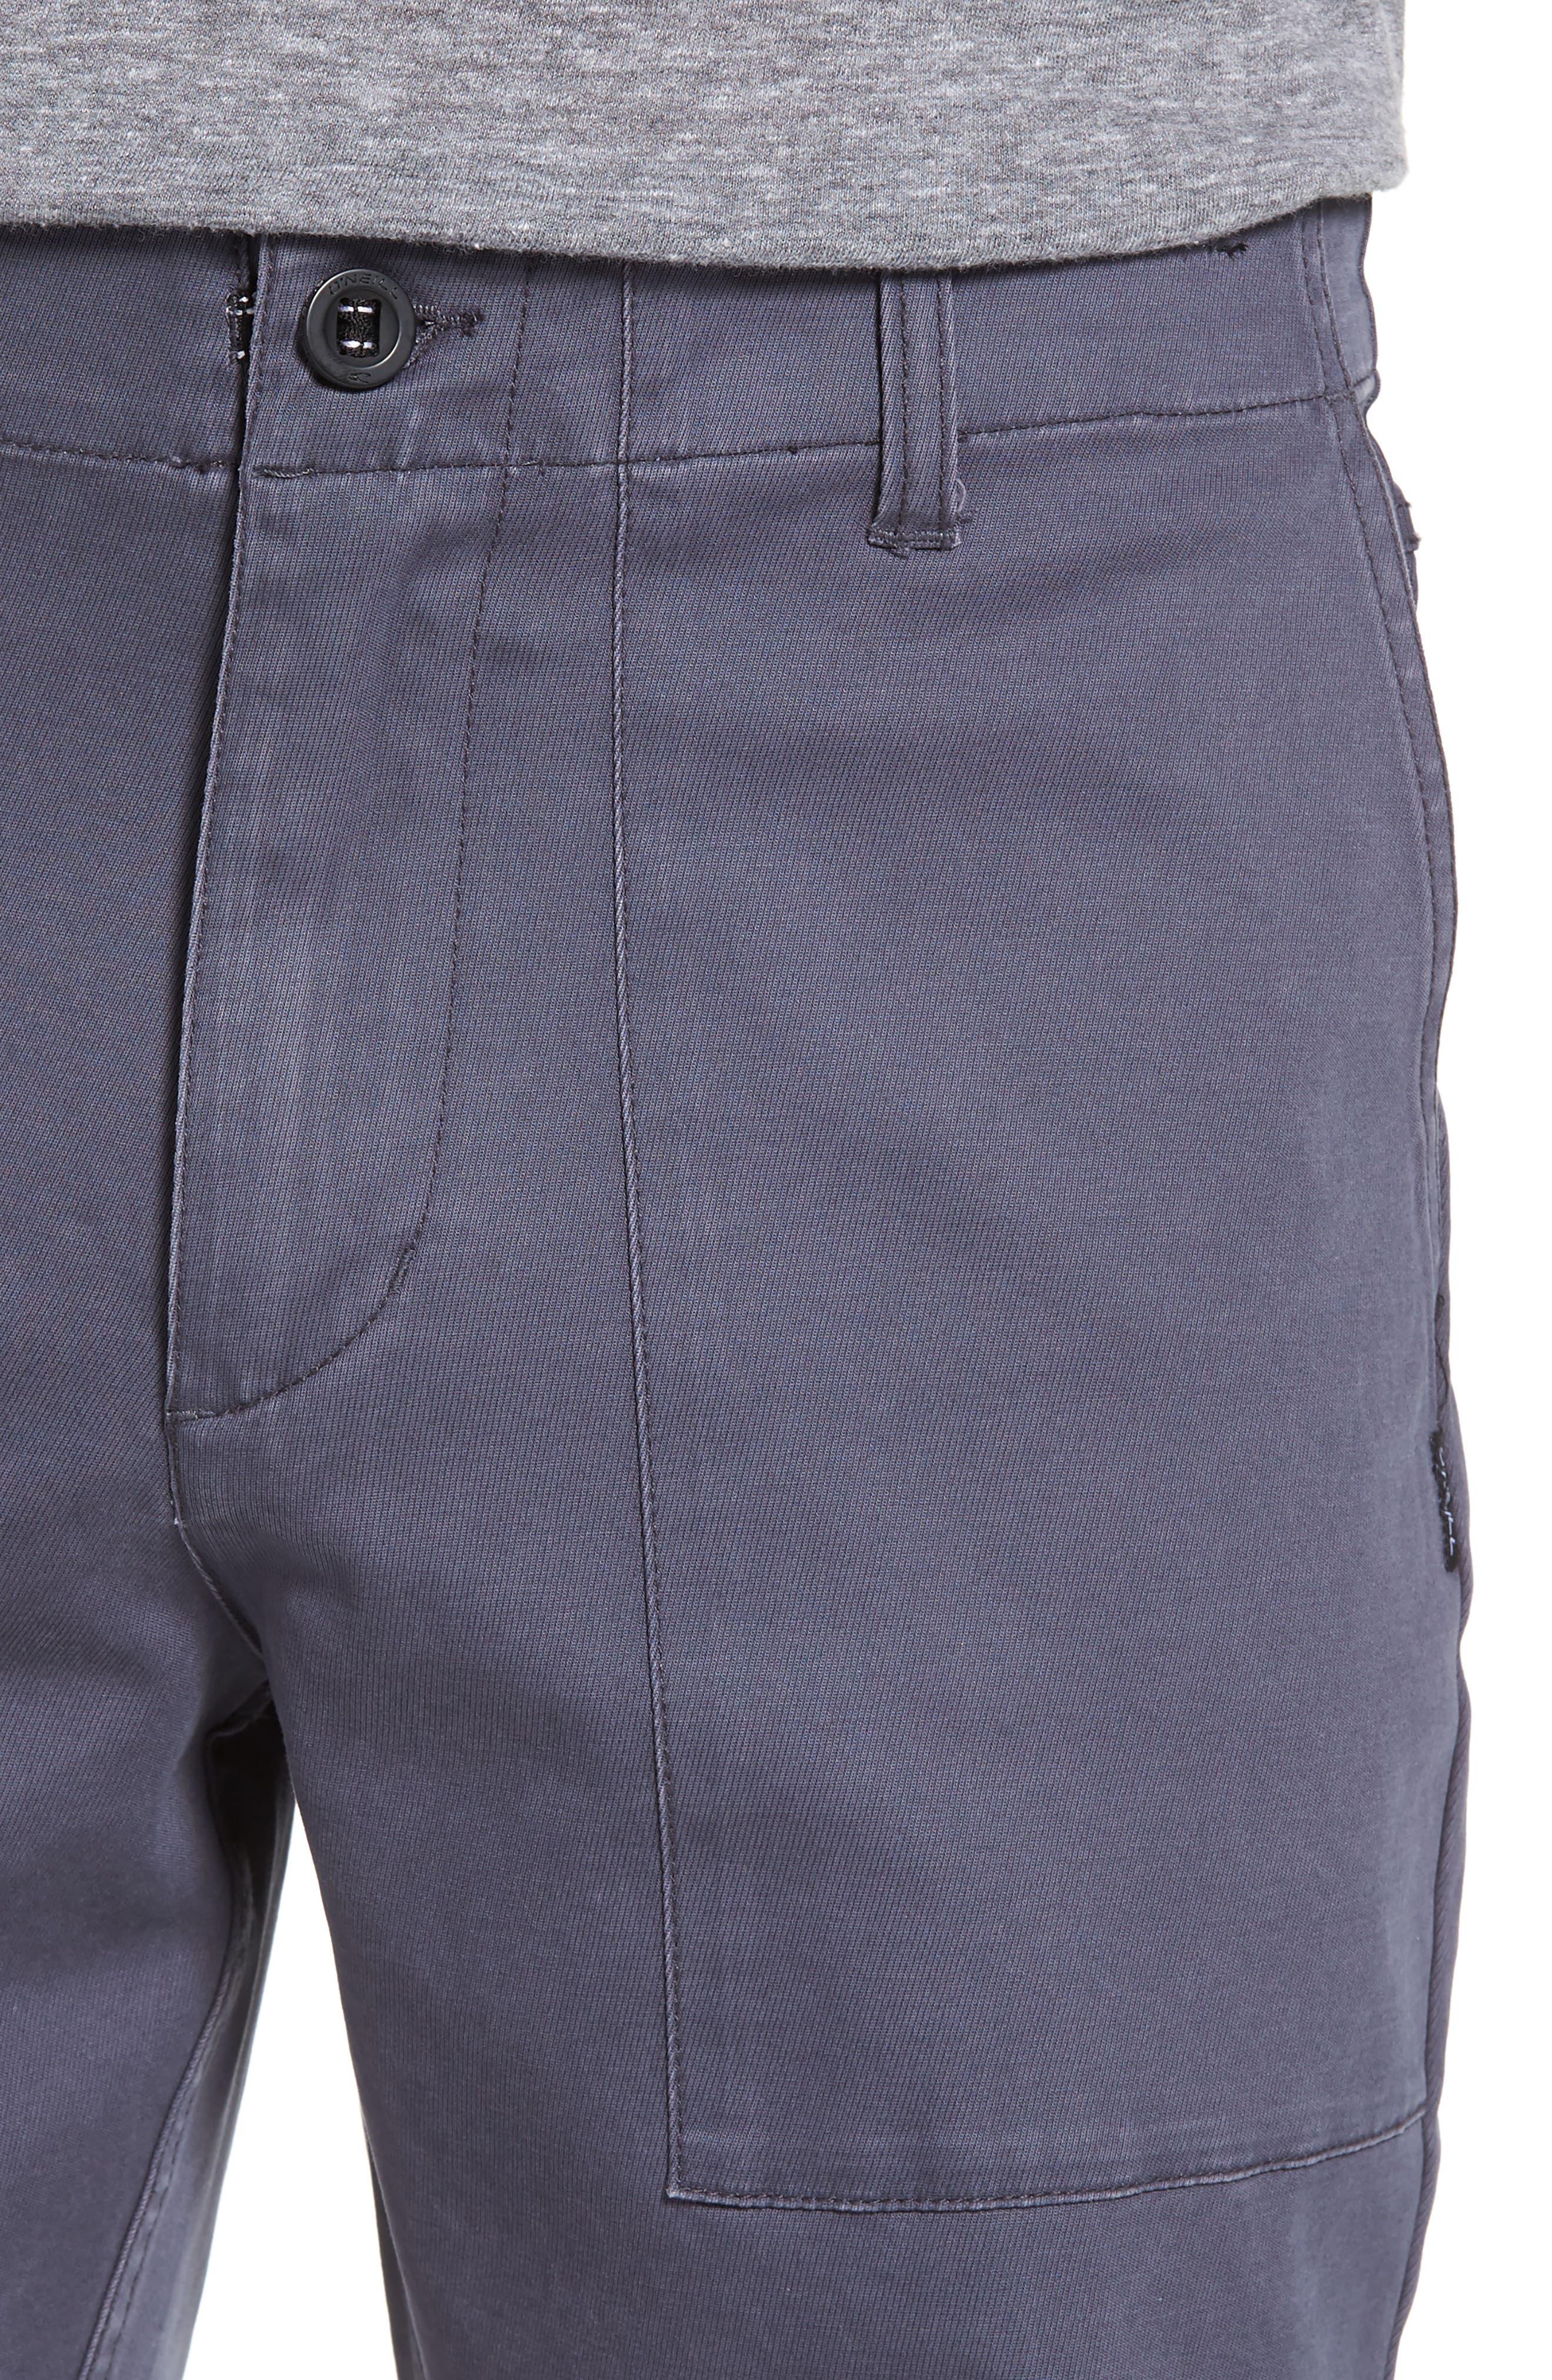 Naples Camp Shorts,                             Alternate thumbnail 10, color,